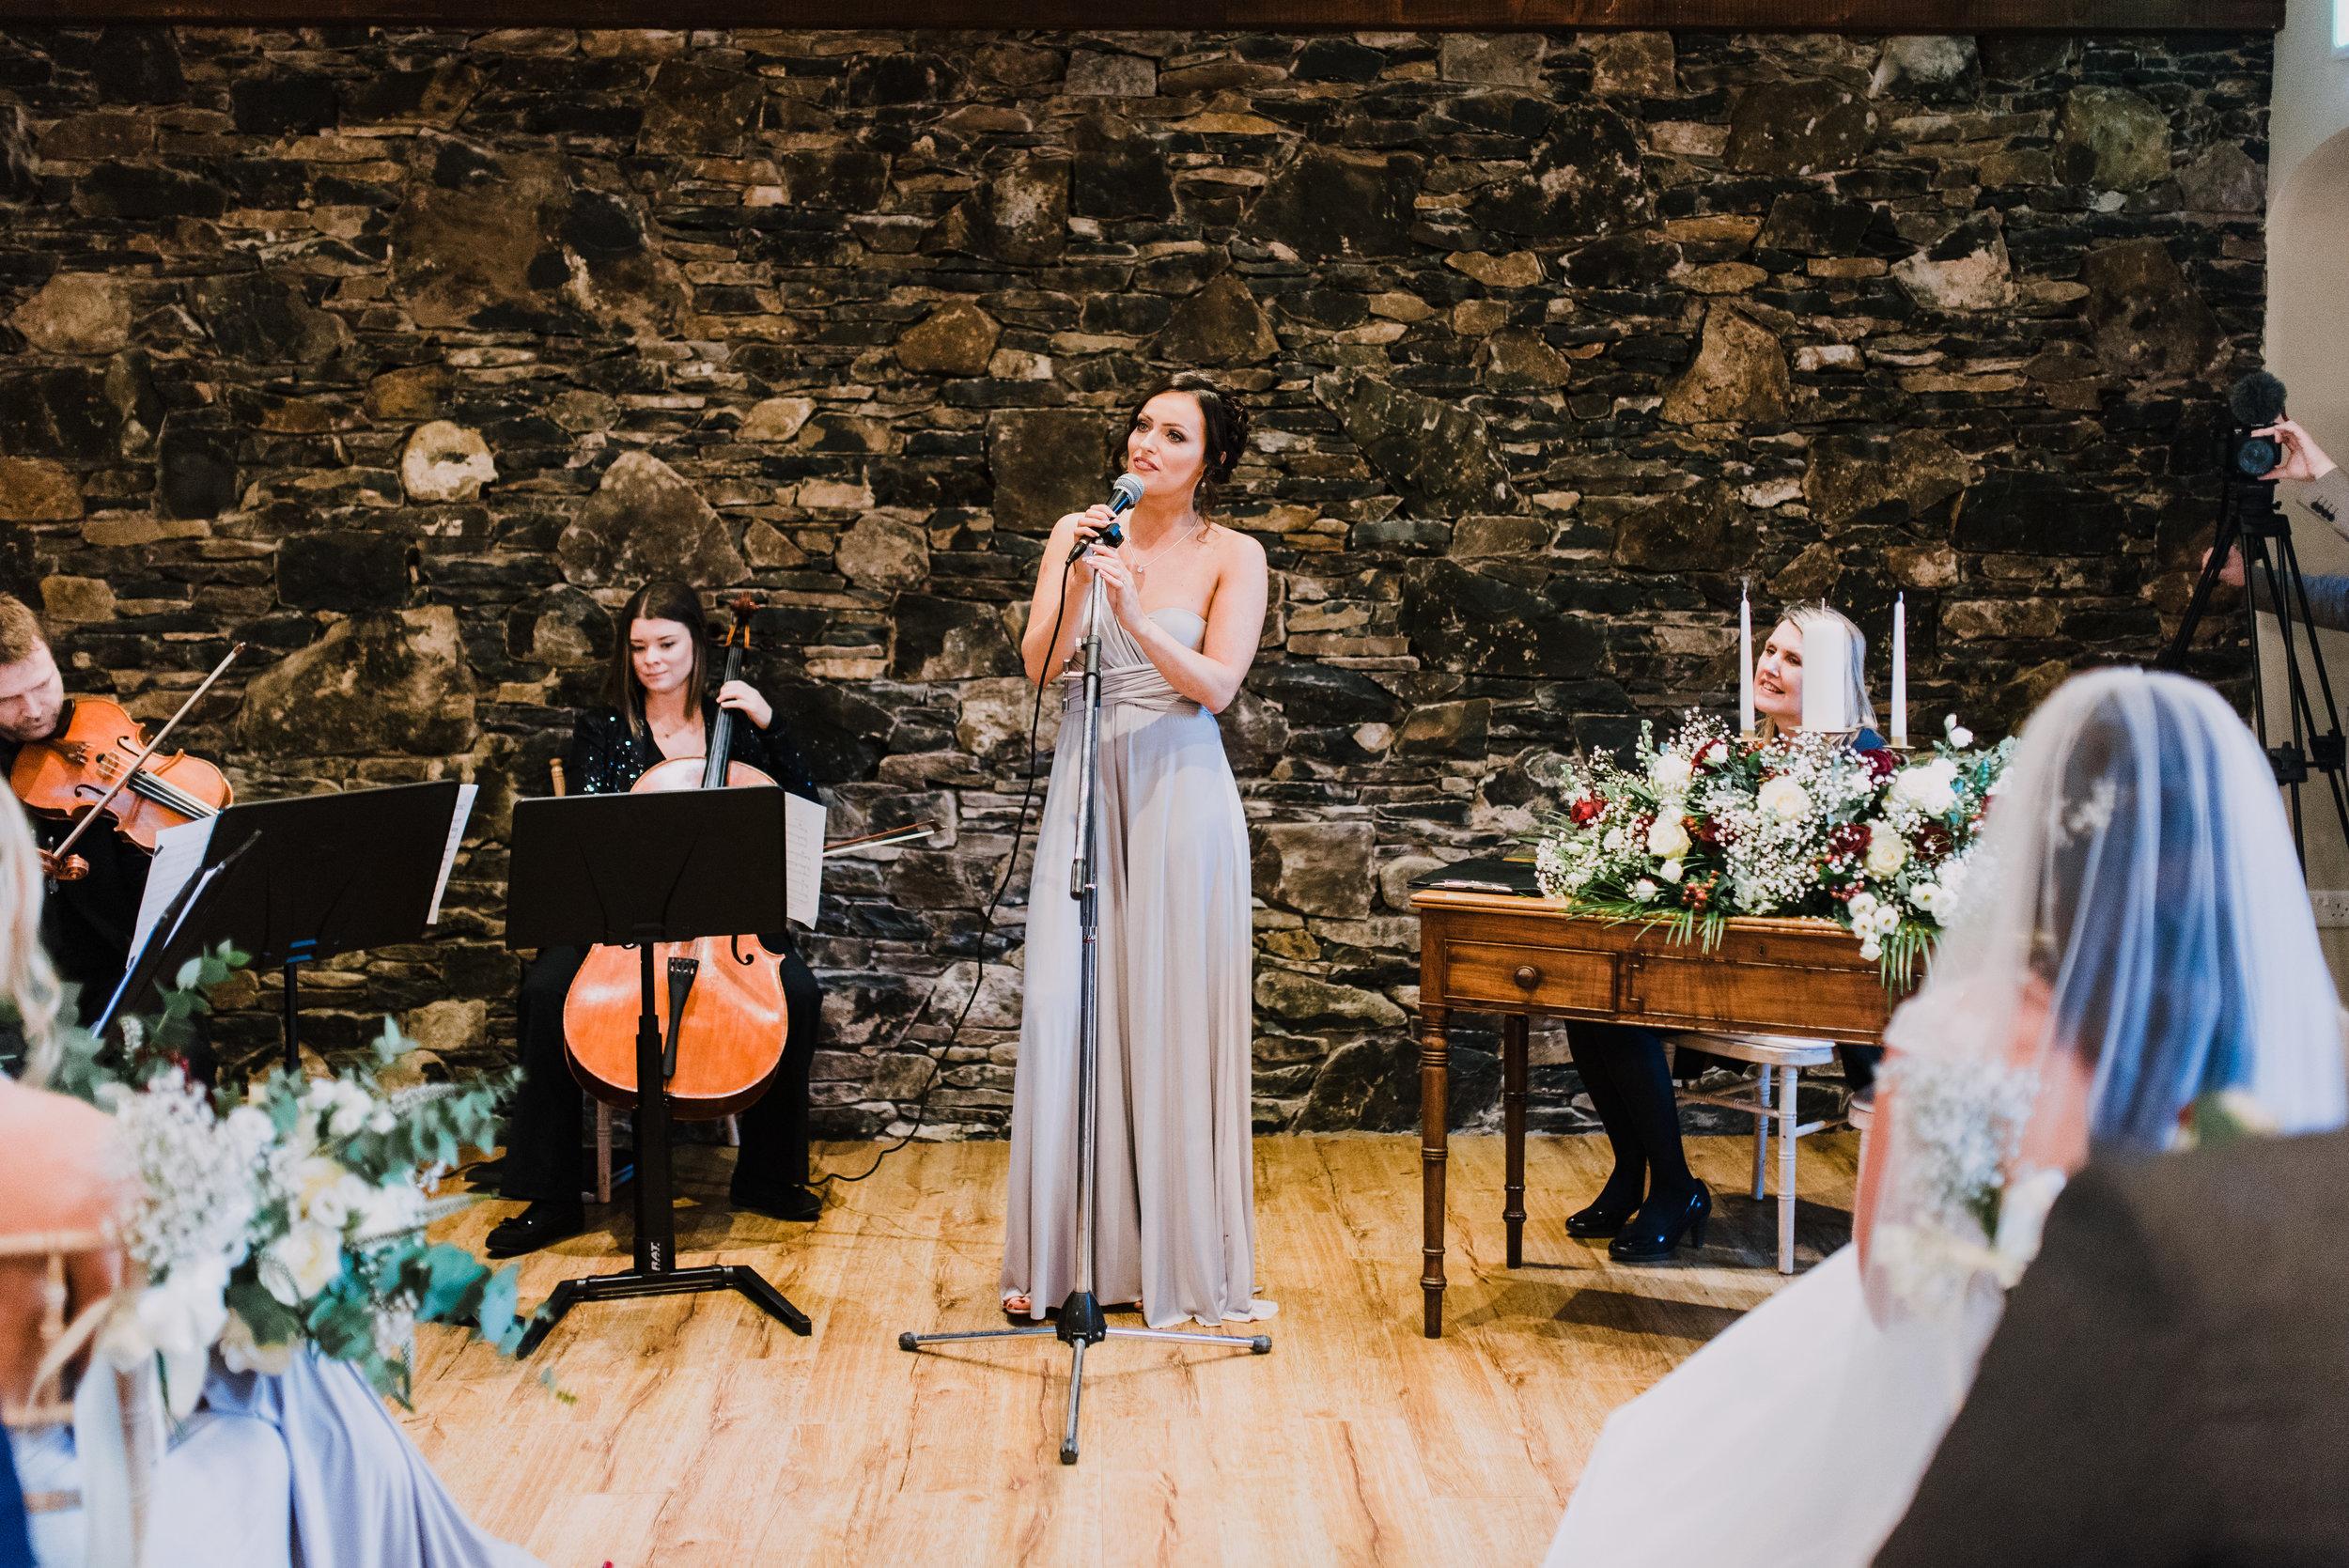 larchfield estate wedding, wedding venues northern ireland, barn wedding venues northern ireland, quirky weddings northern ireland, 5 star wedding venues ni, wedding ceremony larchfield estate  (9).jpg